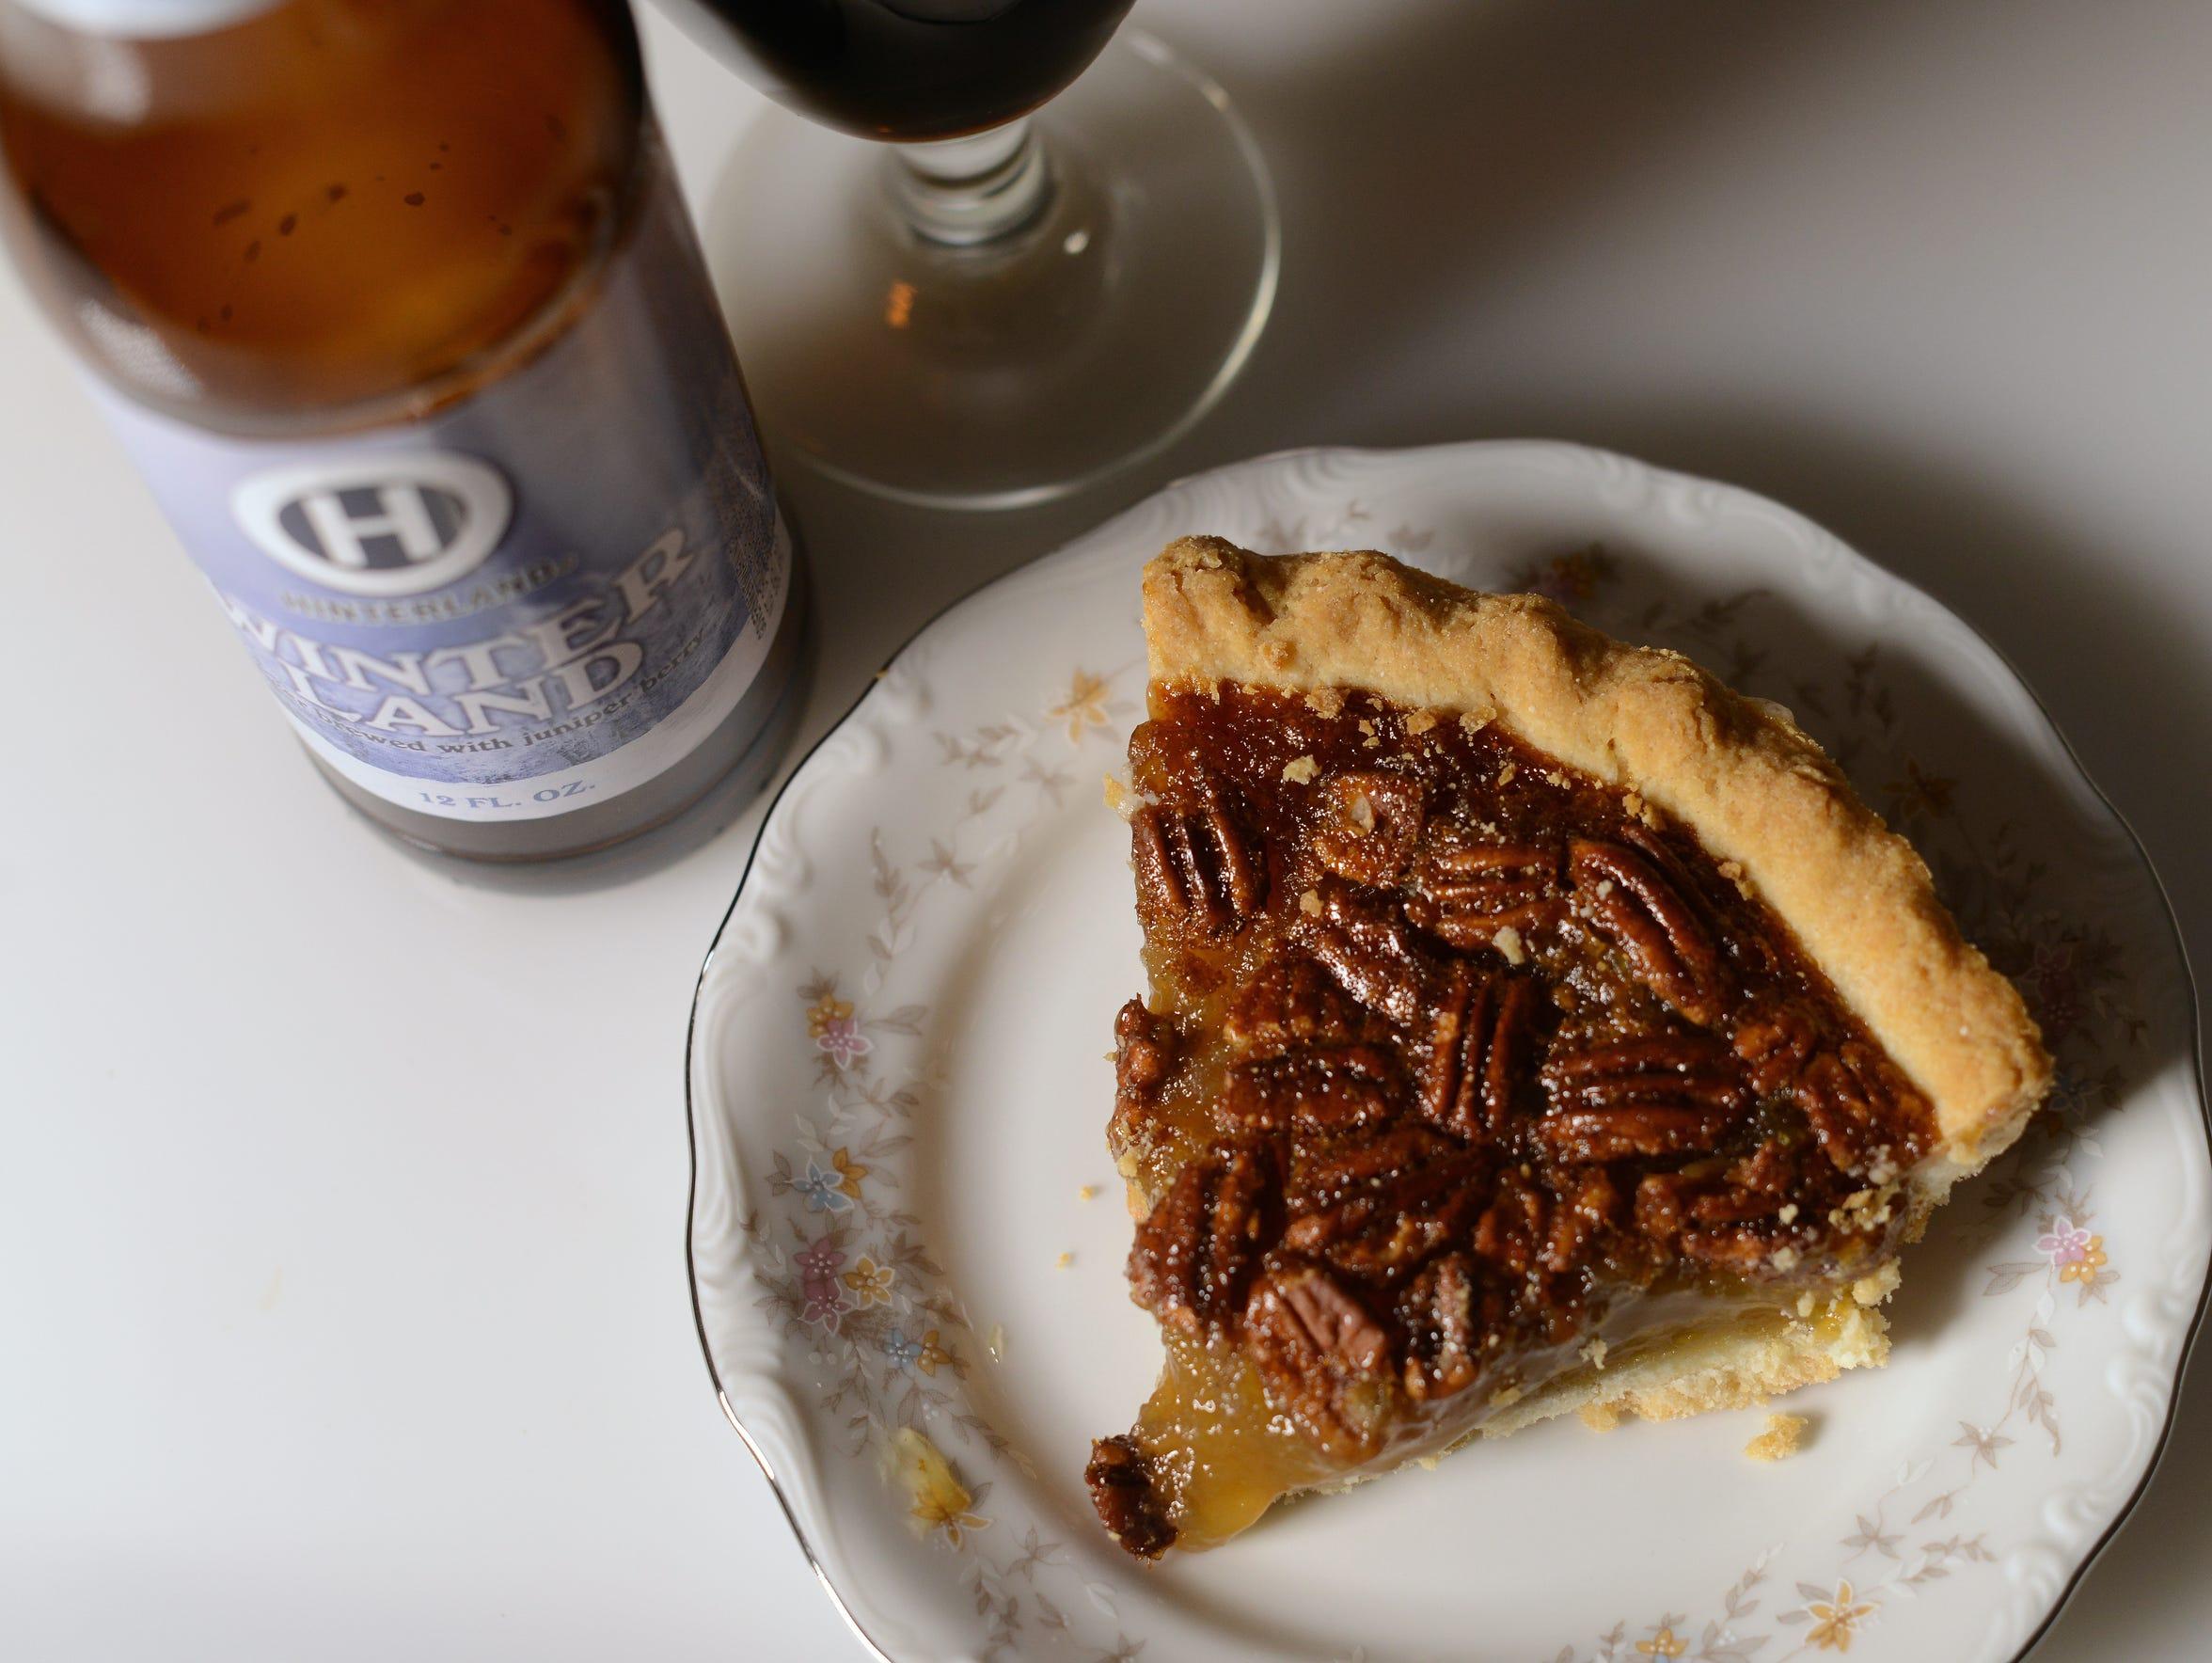 Pecan pie paired with Hinterland's Winterland.